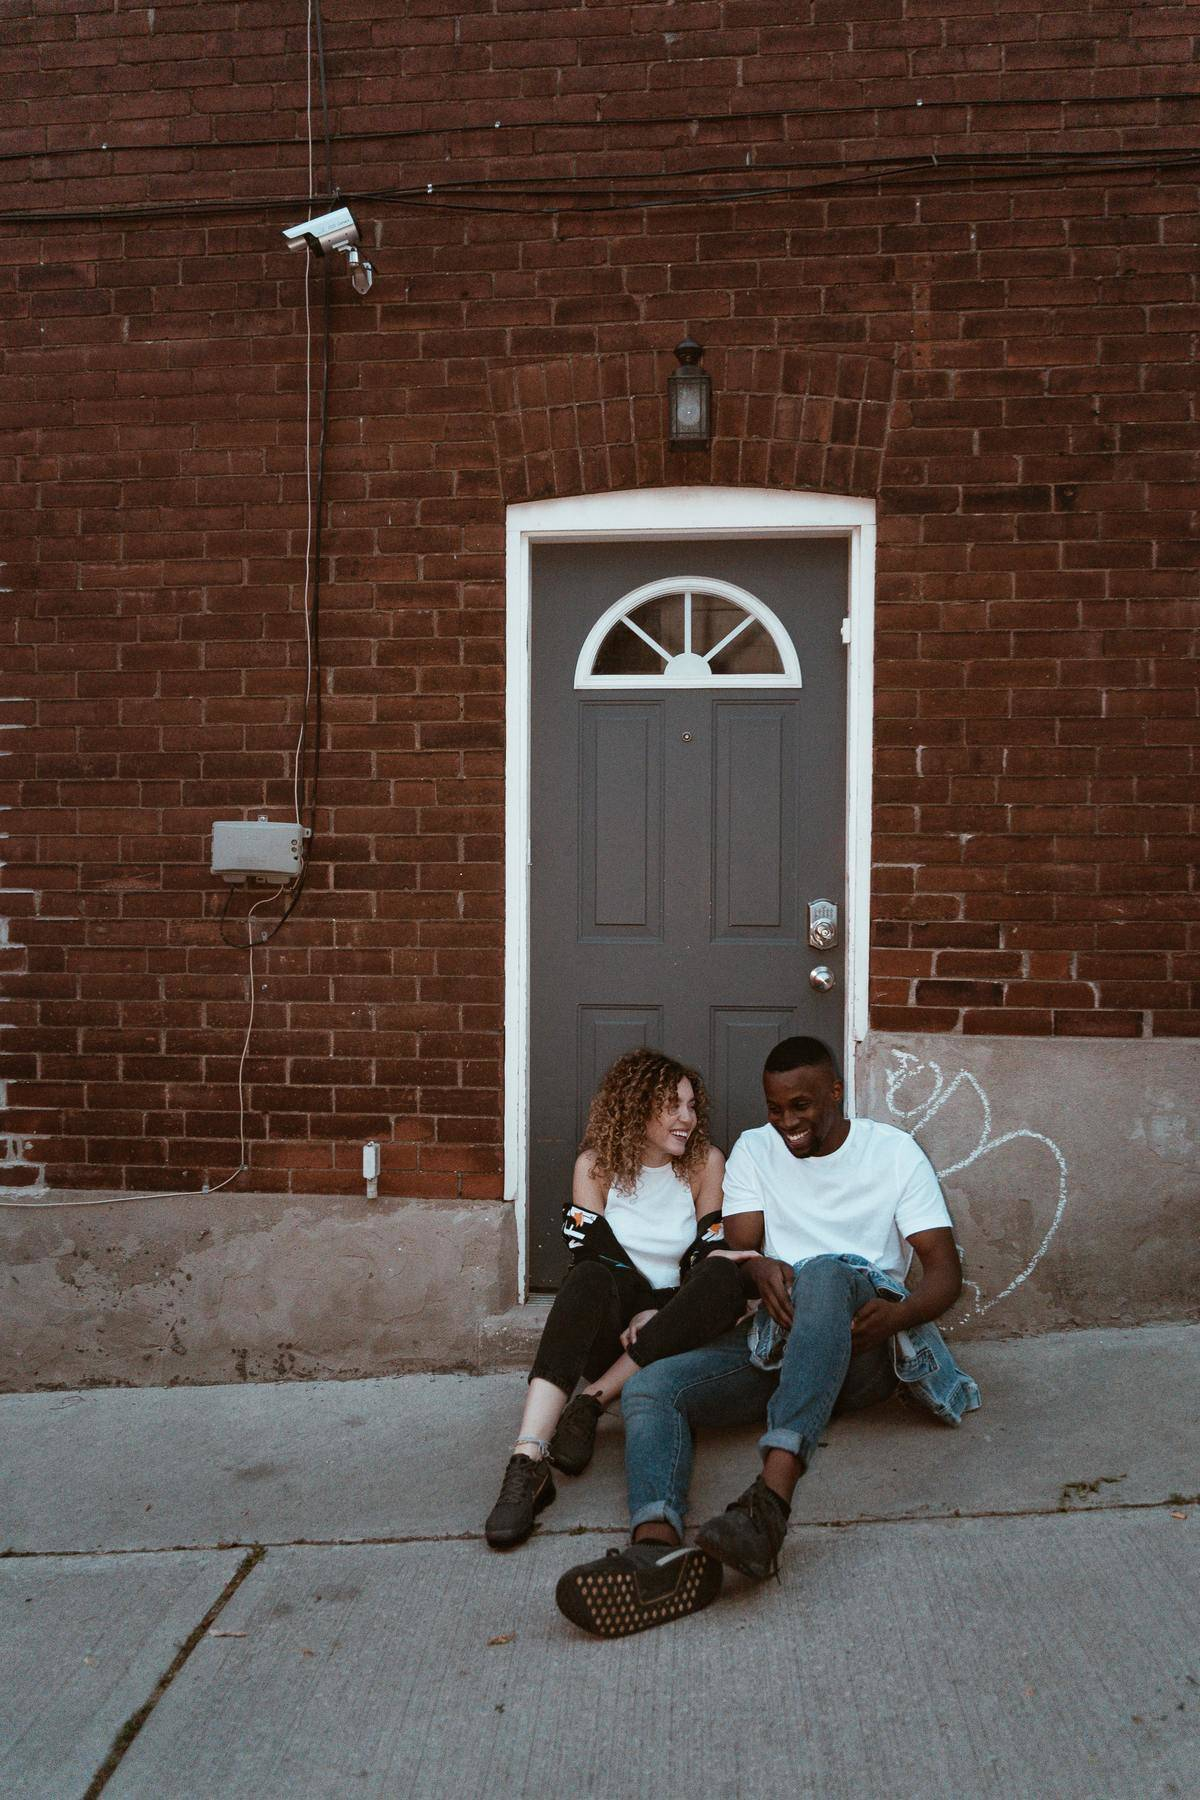 People sit in doorway outside unit entry